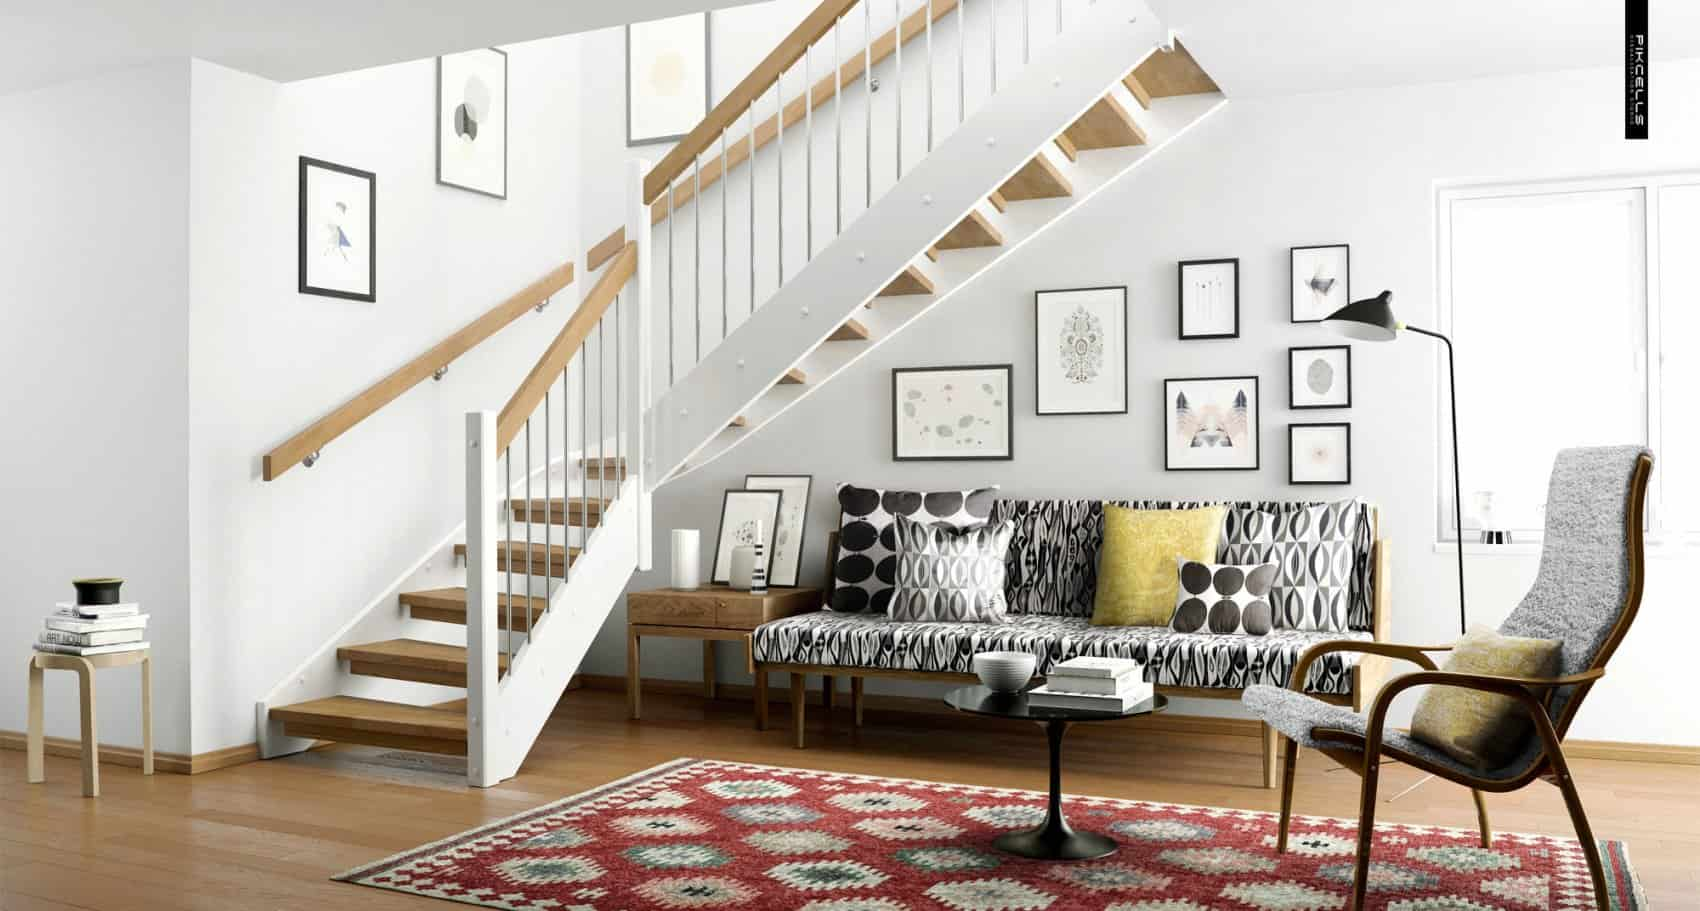 under-the-stairs-scandinavian-decor